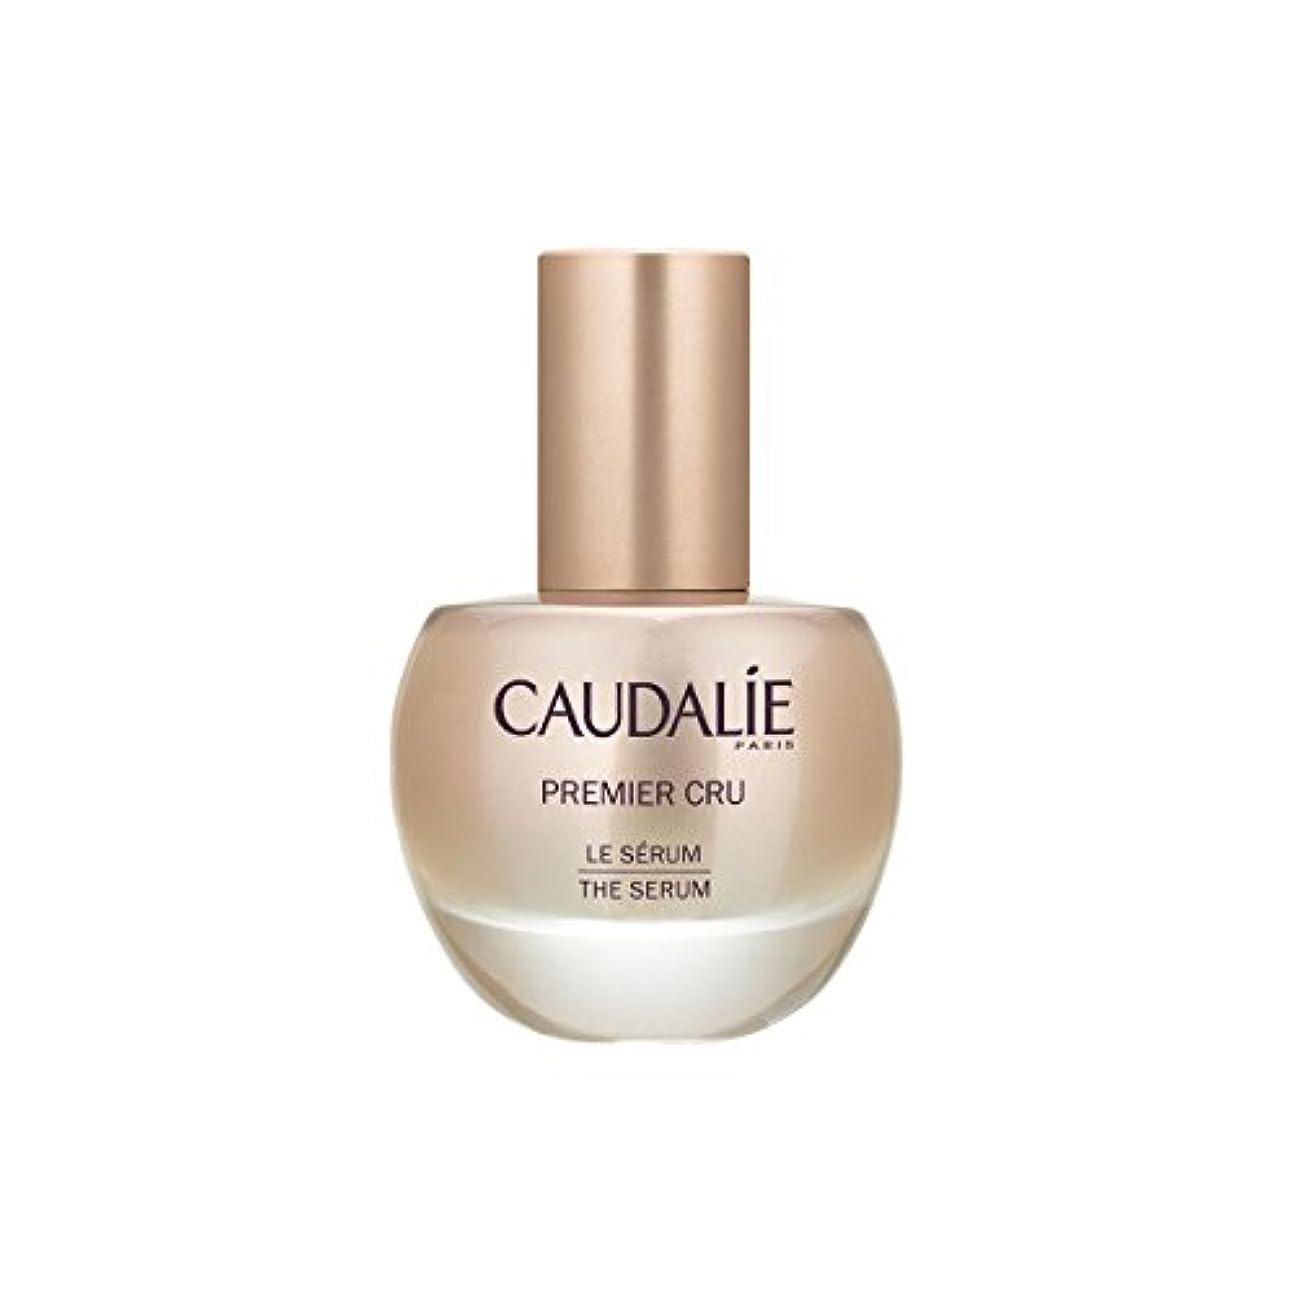 Caudalie Premier Cru Serum 30ml [並行輸入品]